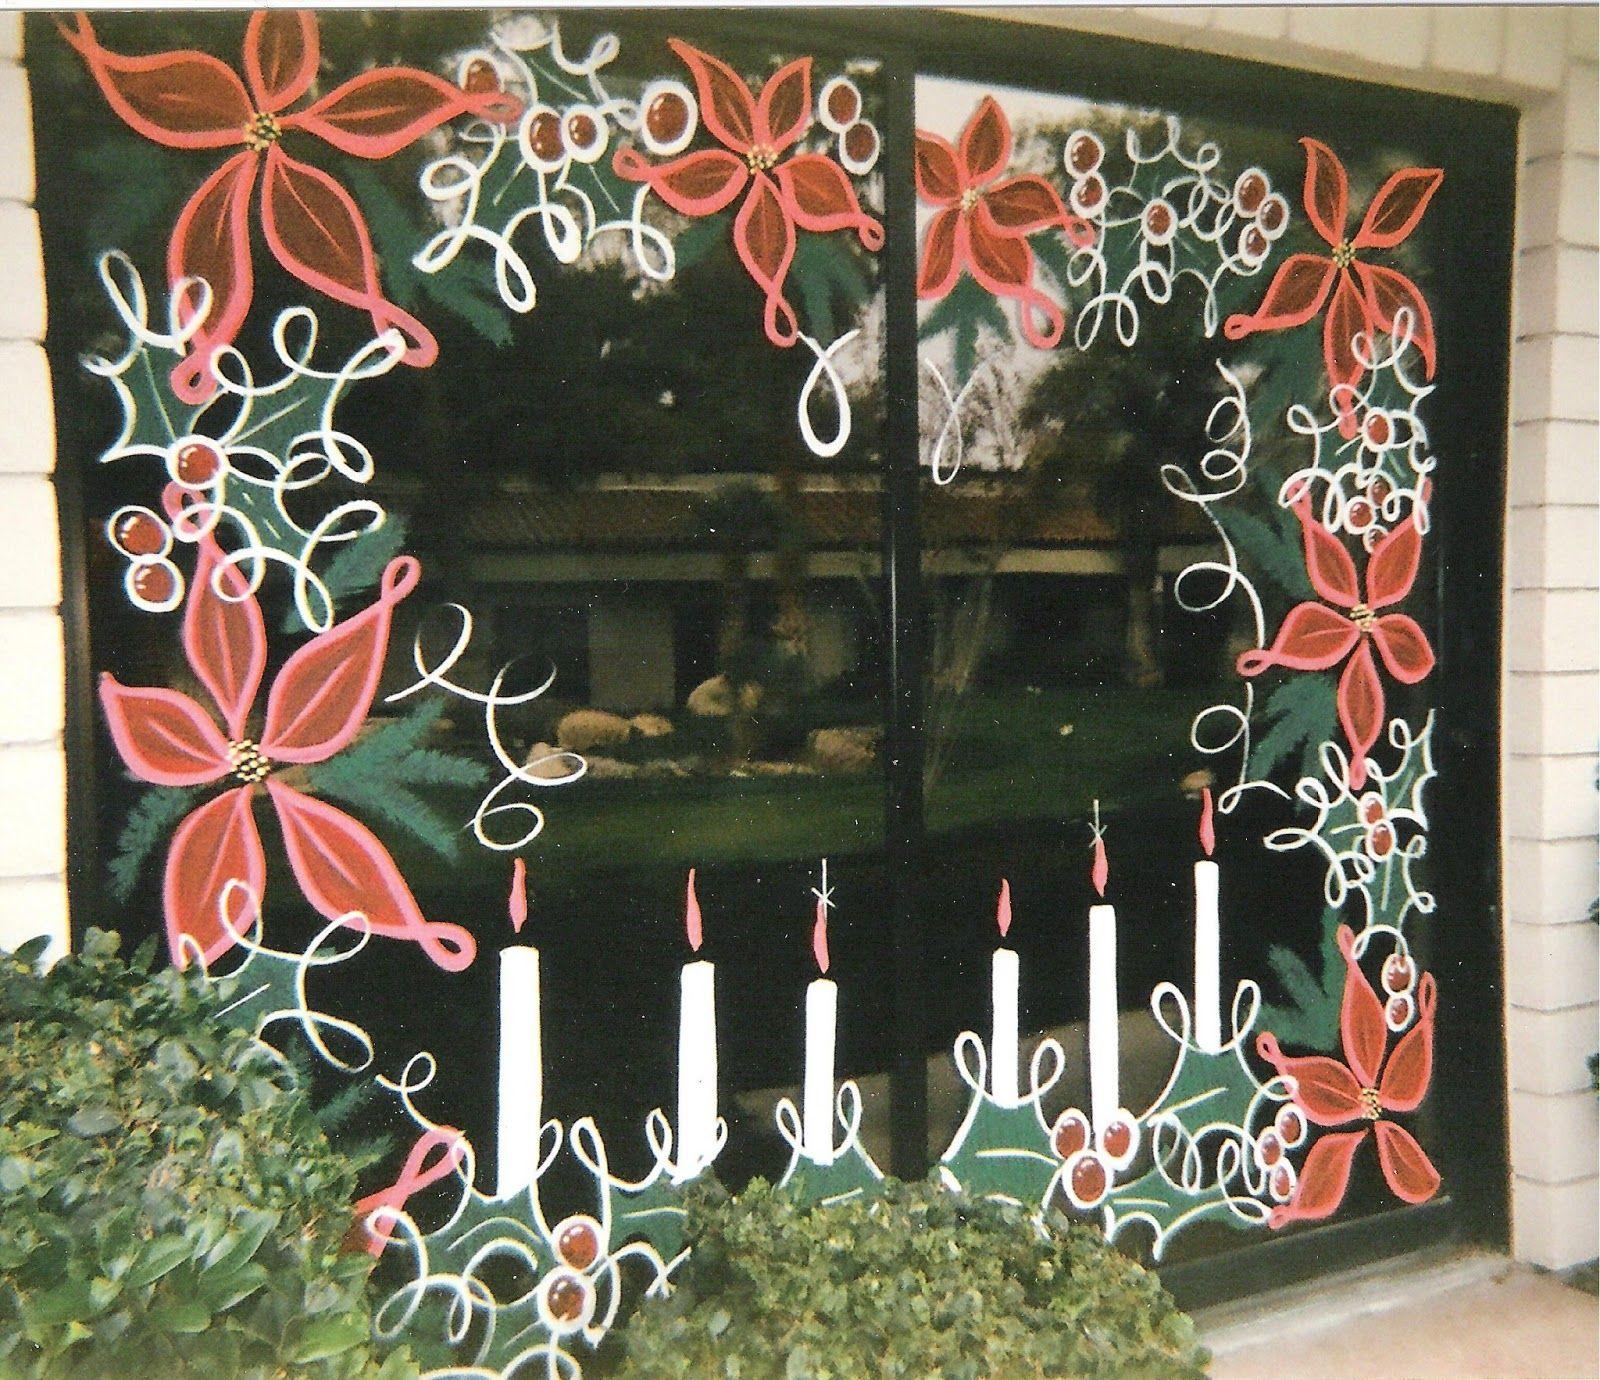 Off Season For Window Painters Painted Window Art Christmas Window Painting Christmas Window Decorations